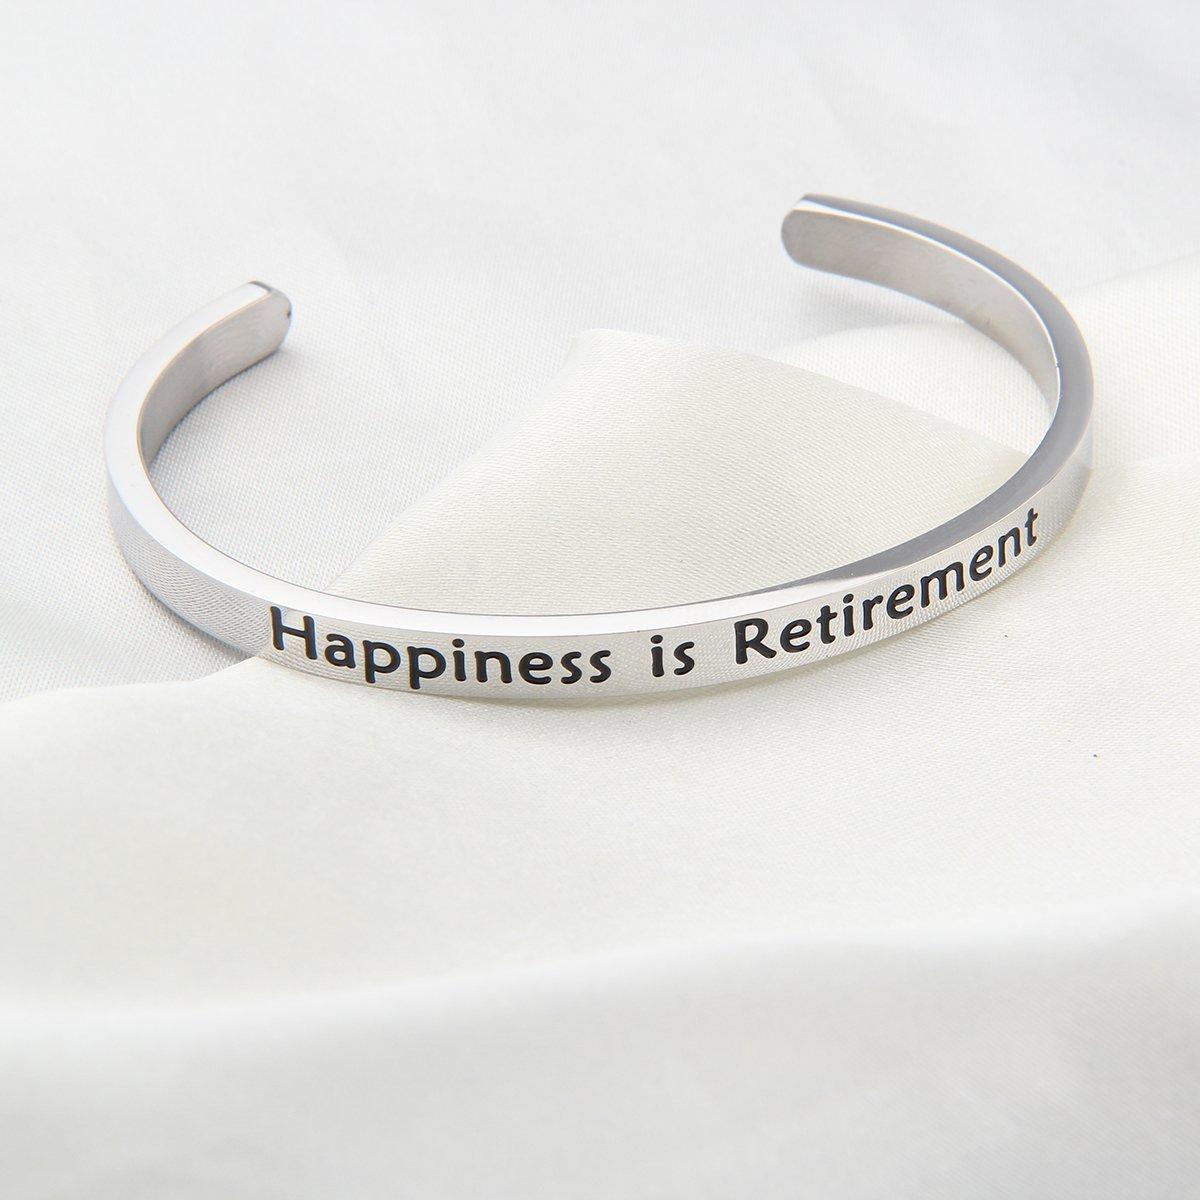 ENSIANTH Happiness is Retirement Cuff Bracelet Retirement Gift for Family,Teacher,Inspiration Gift for Thanksgiving